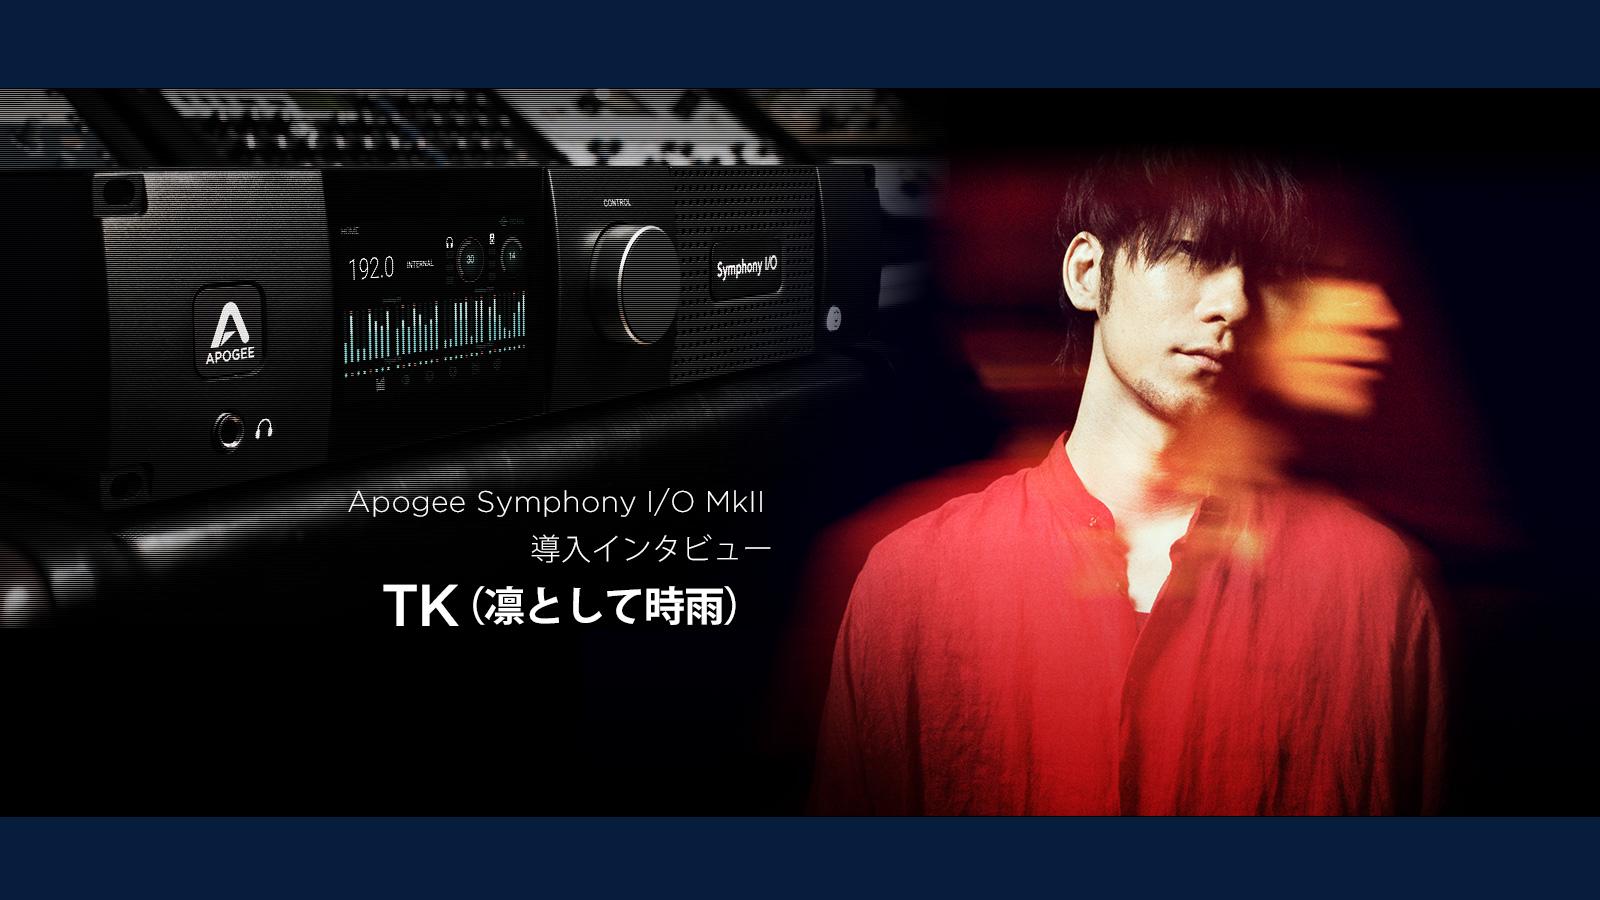 Apogee Symphony I/O MkII 導入インタビュー:TK(凛として時雨)